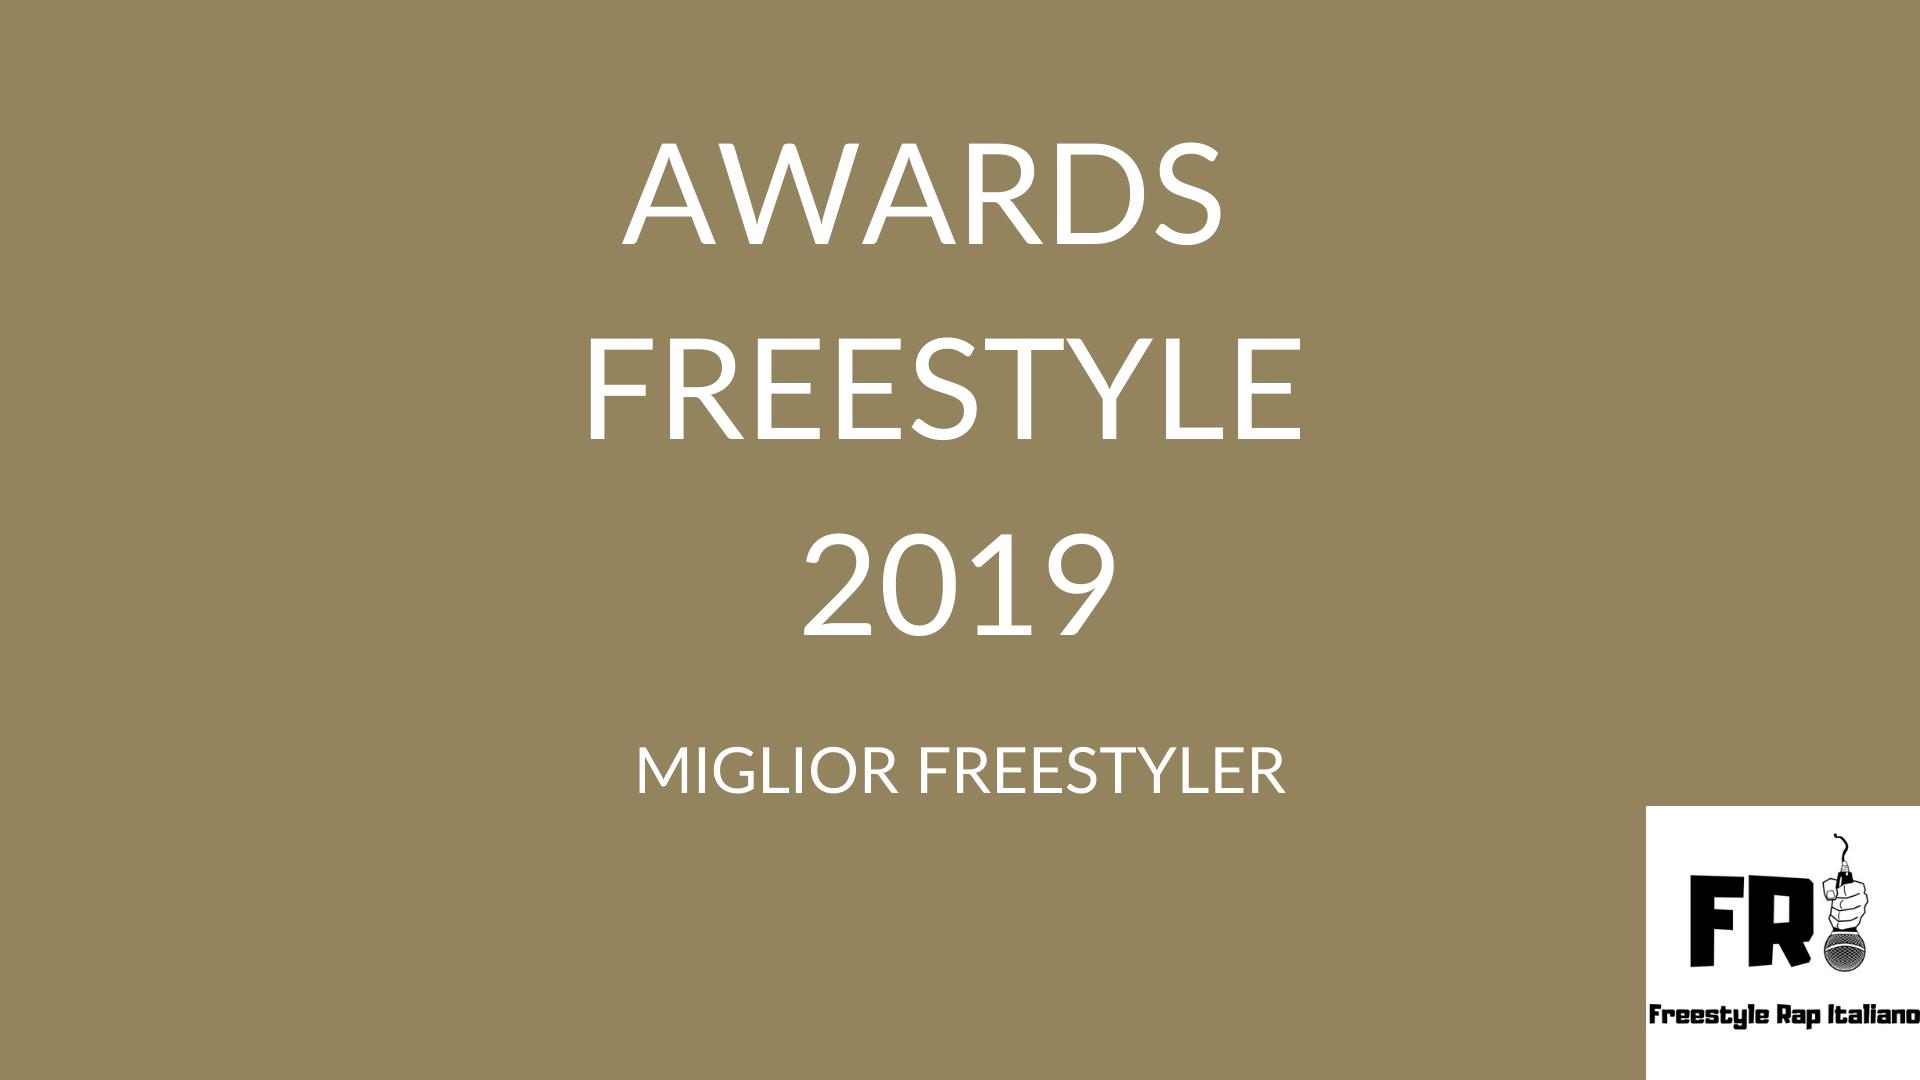 Awards del freestyle 2019 – I migliori freestyler